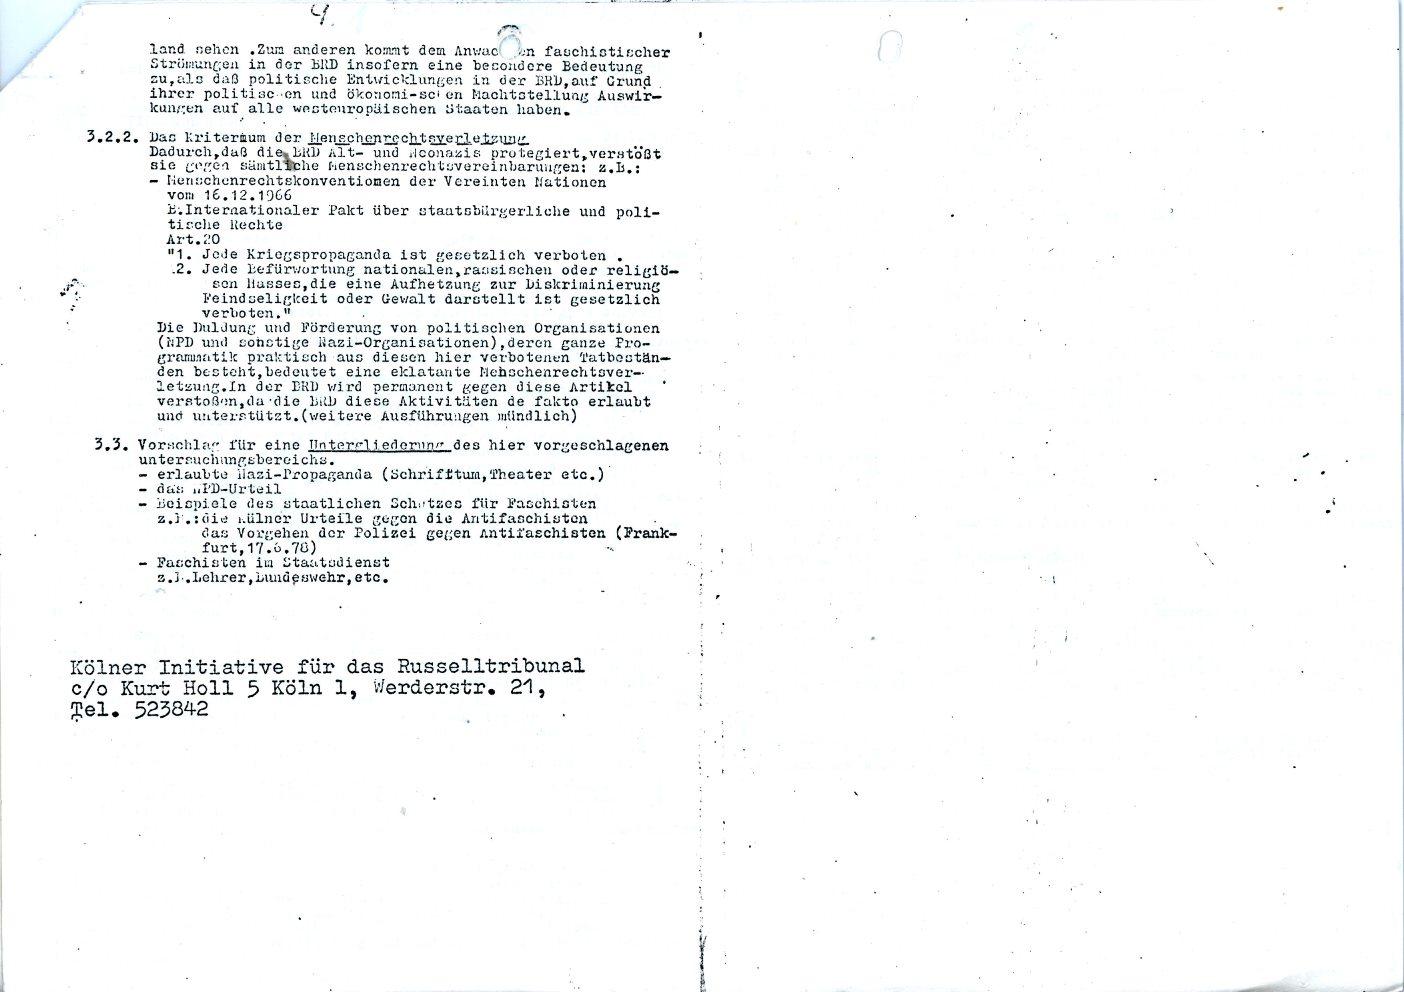 Koeln_Russell_Initiative_Dokumente_1978_08